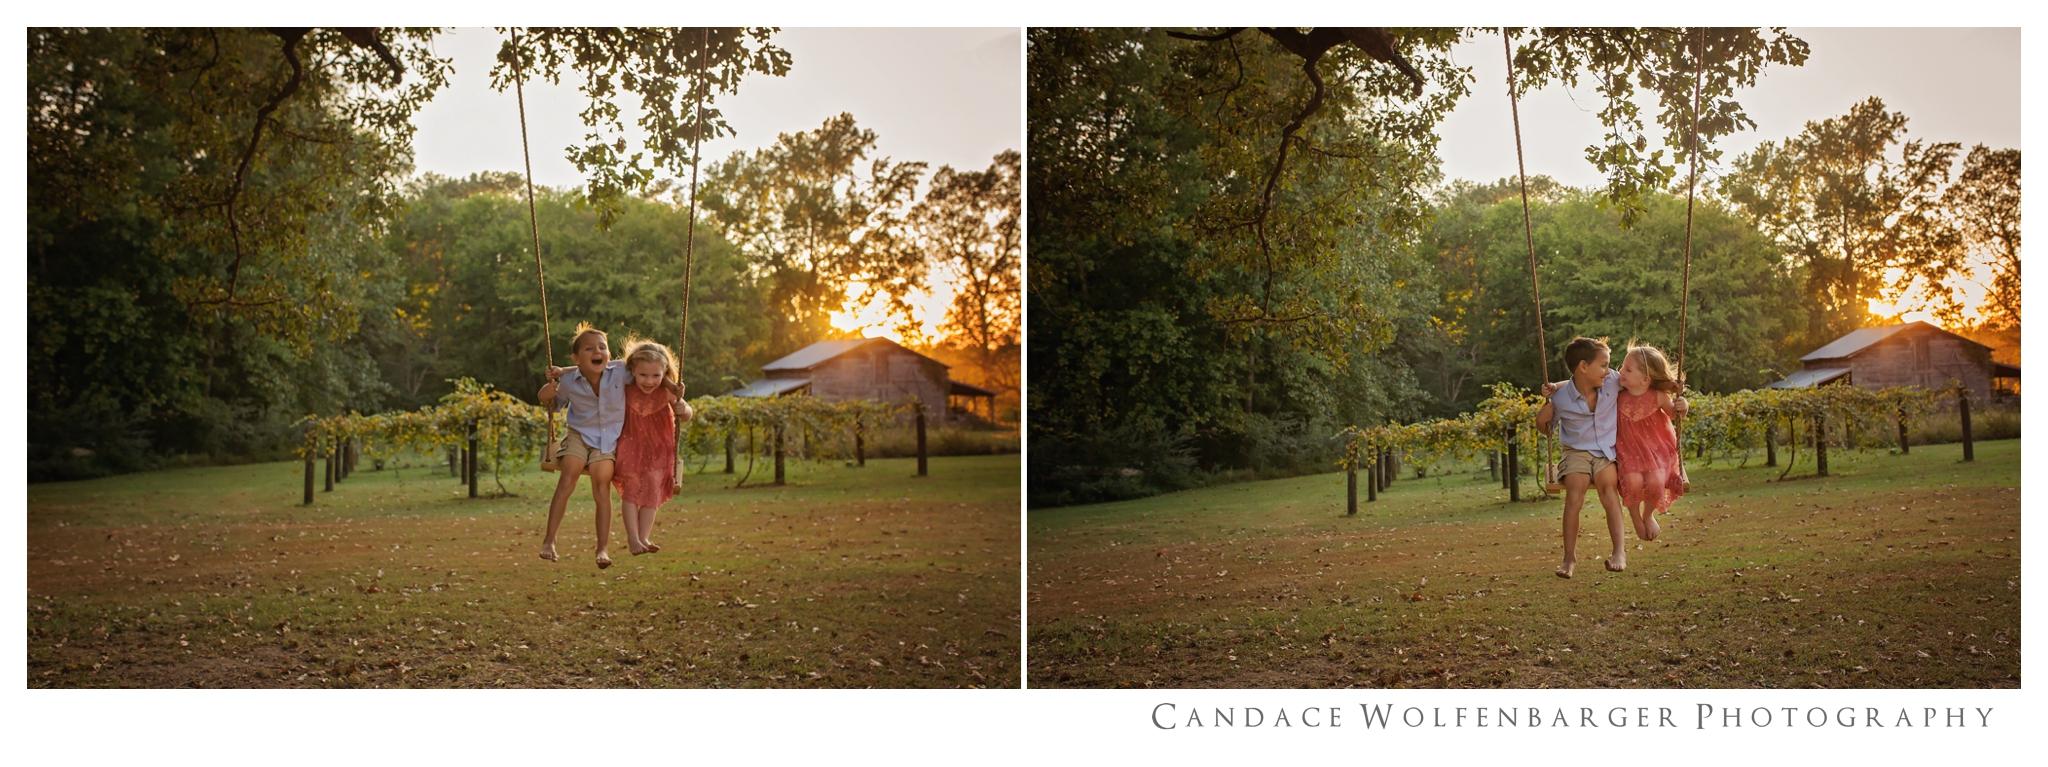 Naaman Caroline Swing Session Candace Wolfenbarger Sanford NC Childrens Photographer 3.jpg